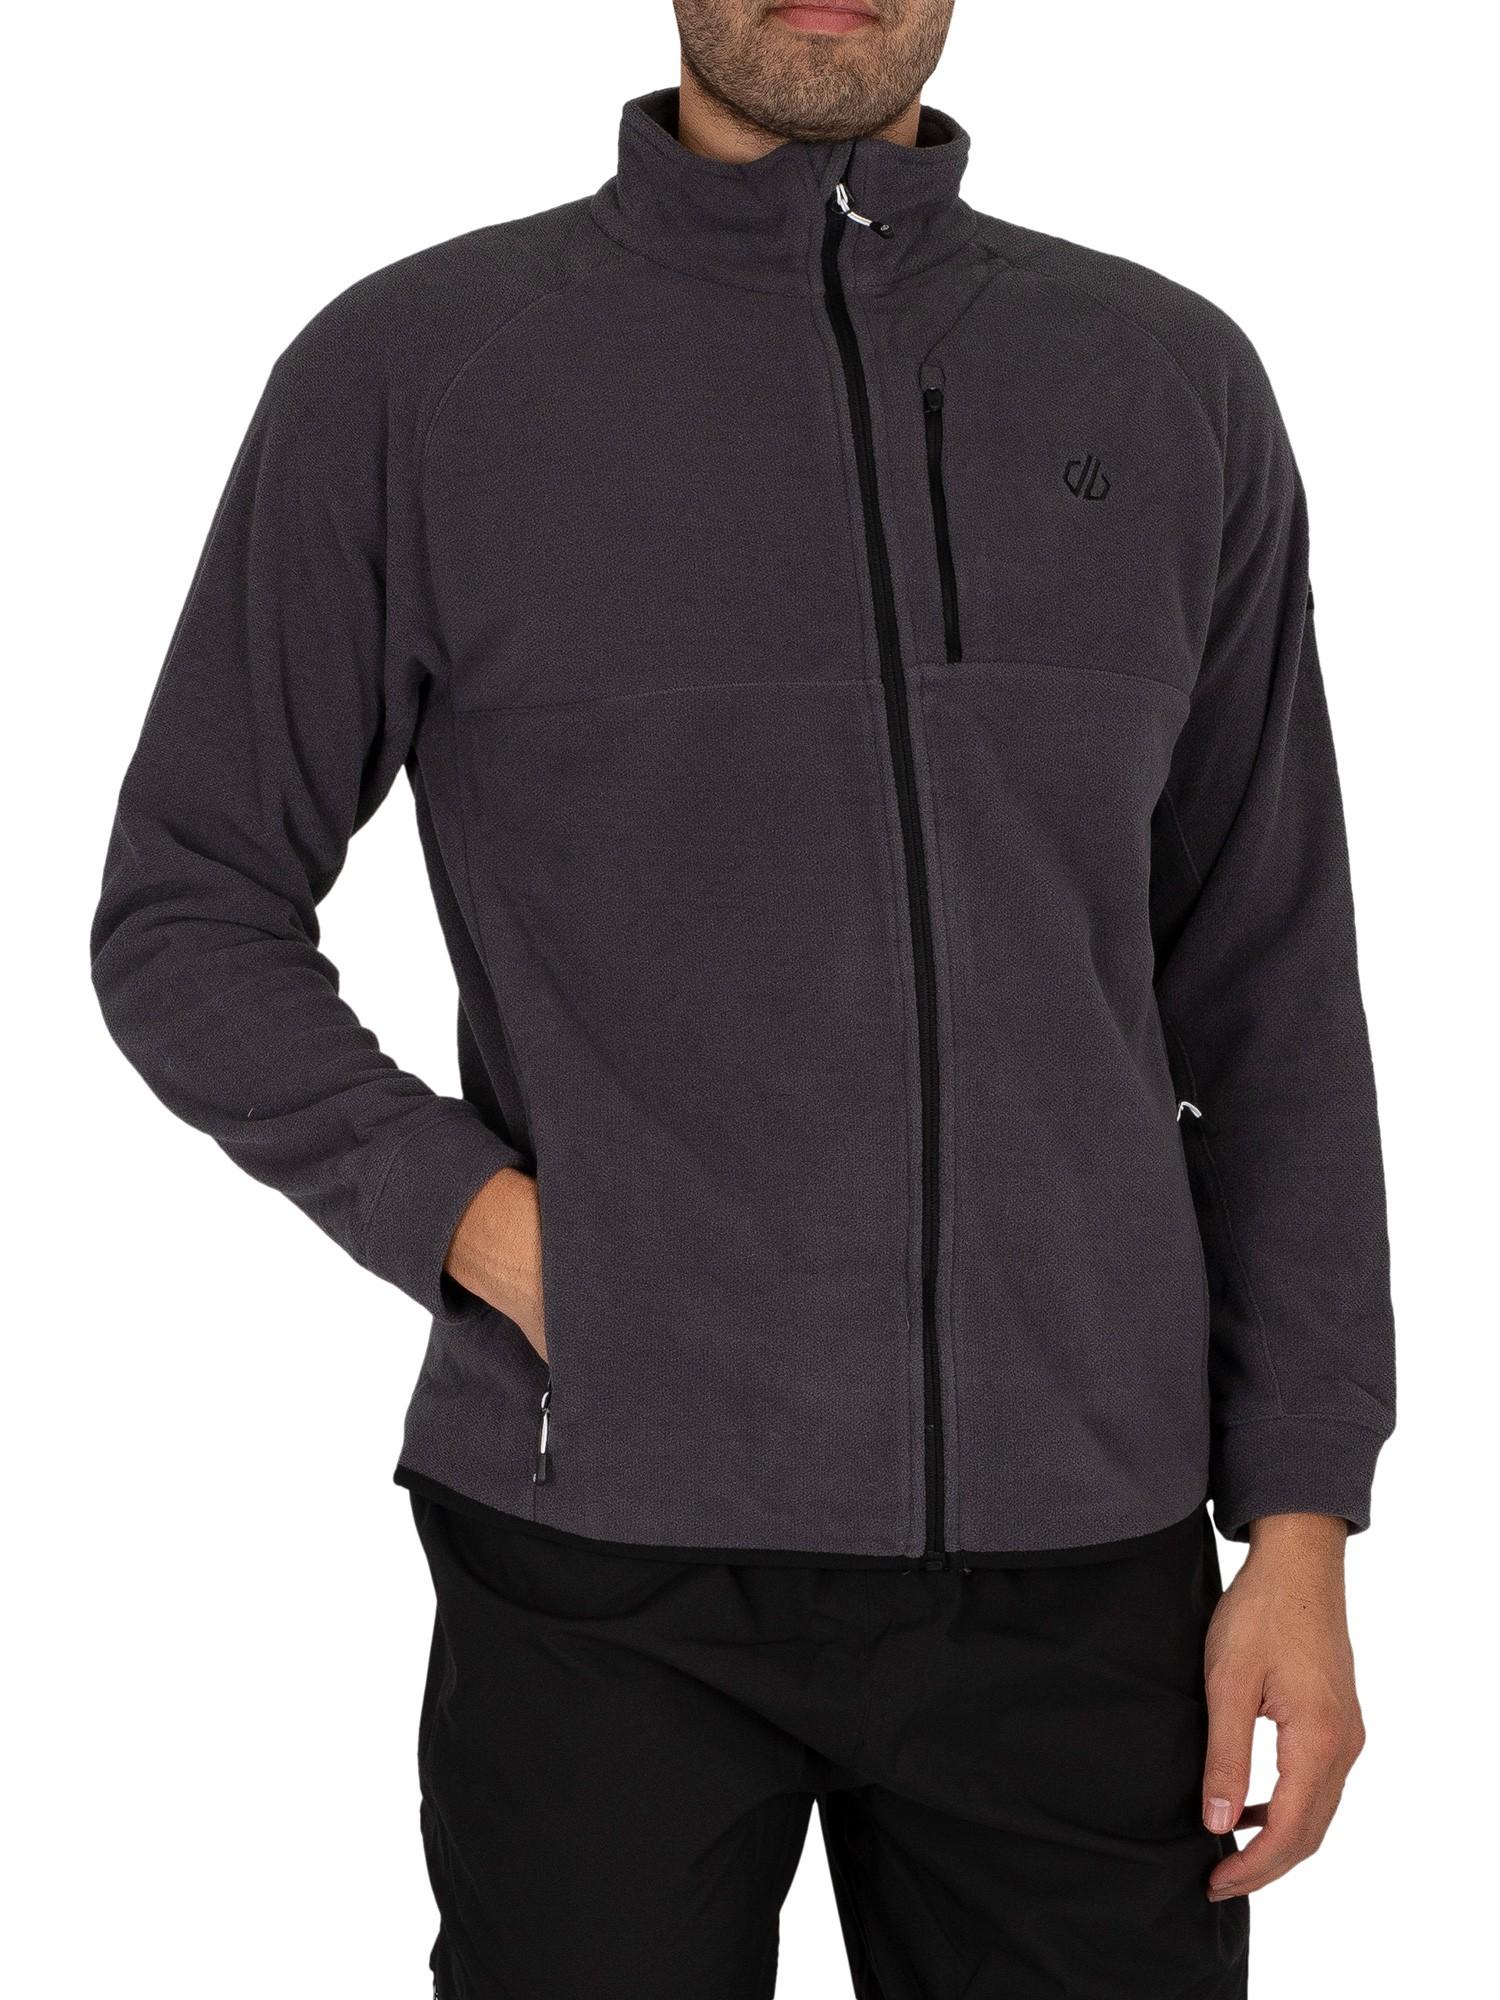 Diluent Fleece Sweatshirt